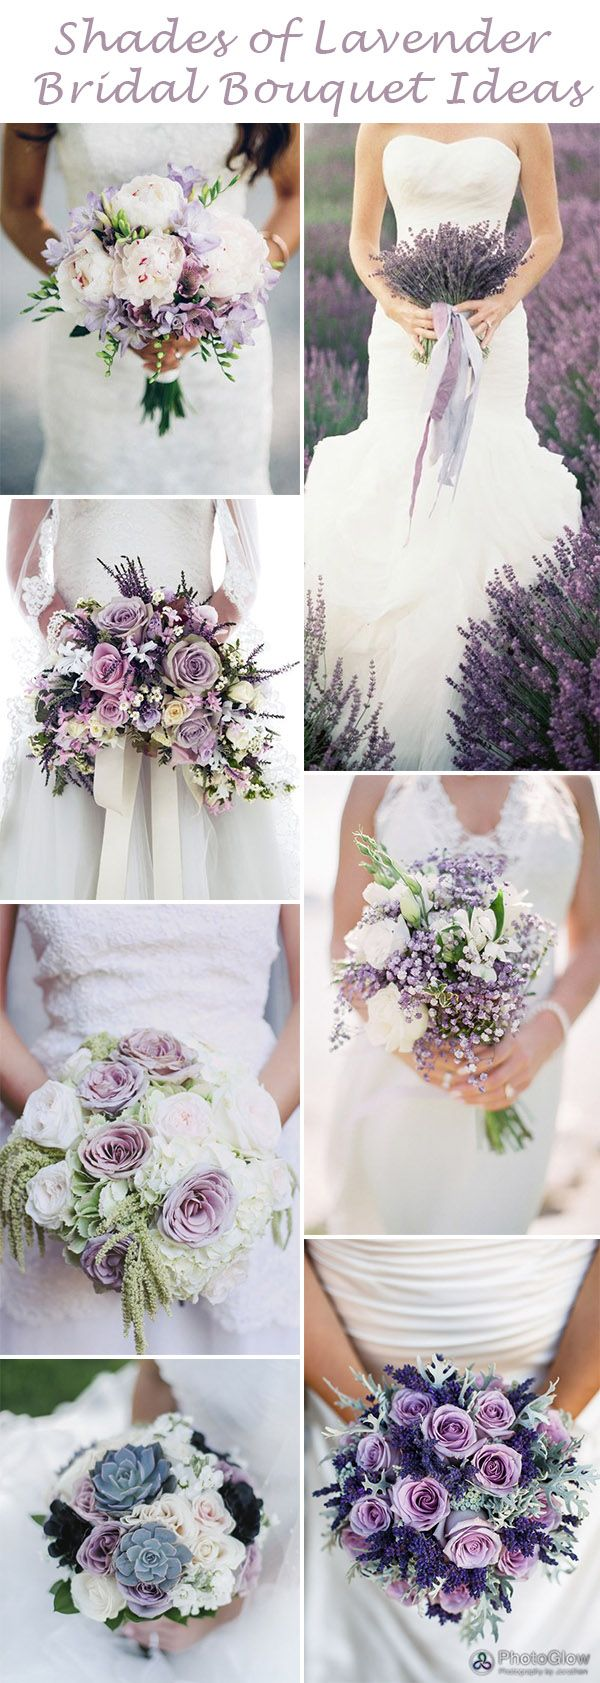 Swoon-Worthy Shades of Lavender Wedding Ideas   Bridal bouquets ...